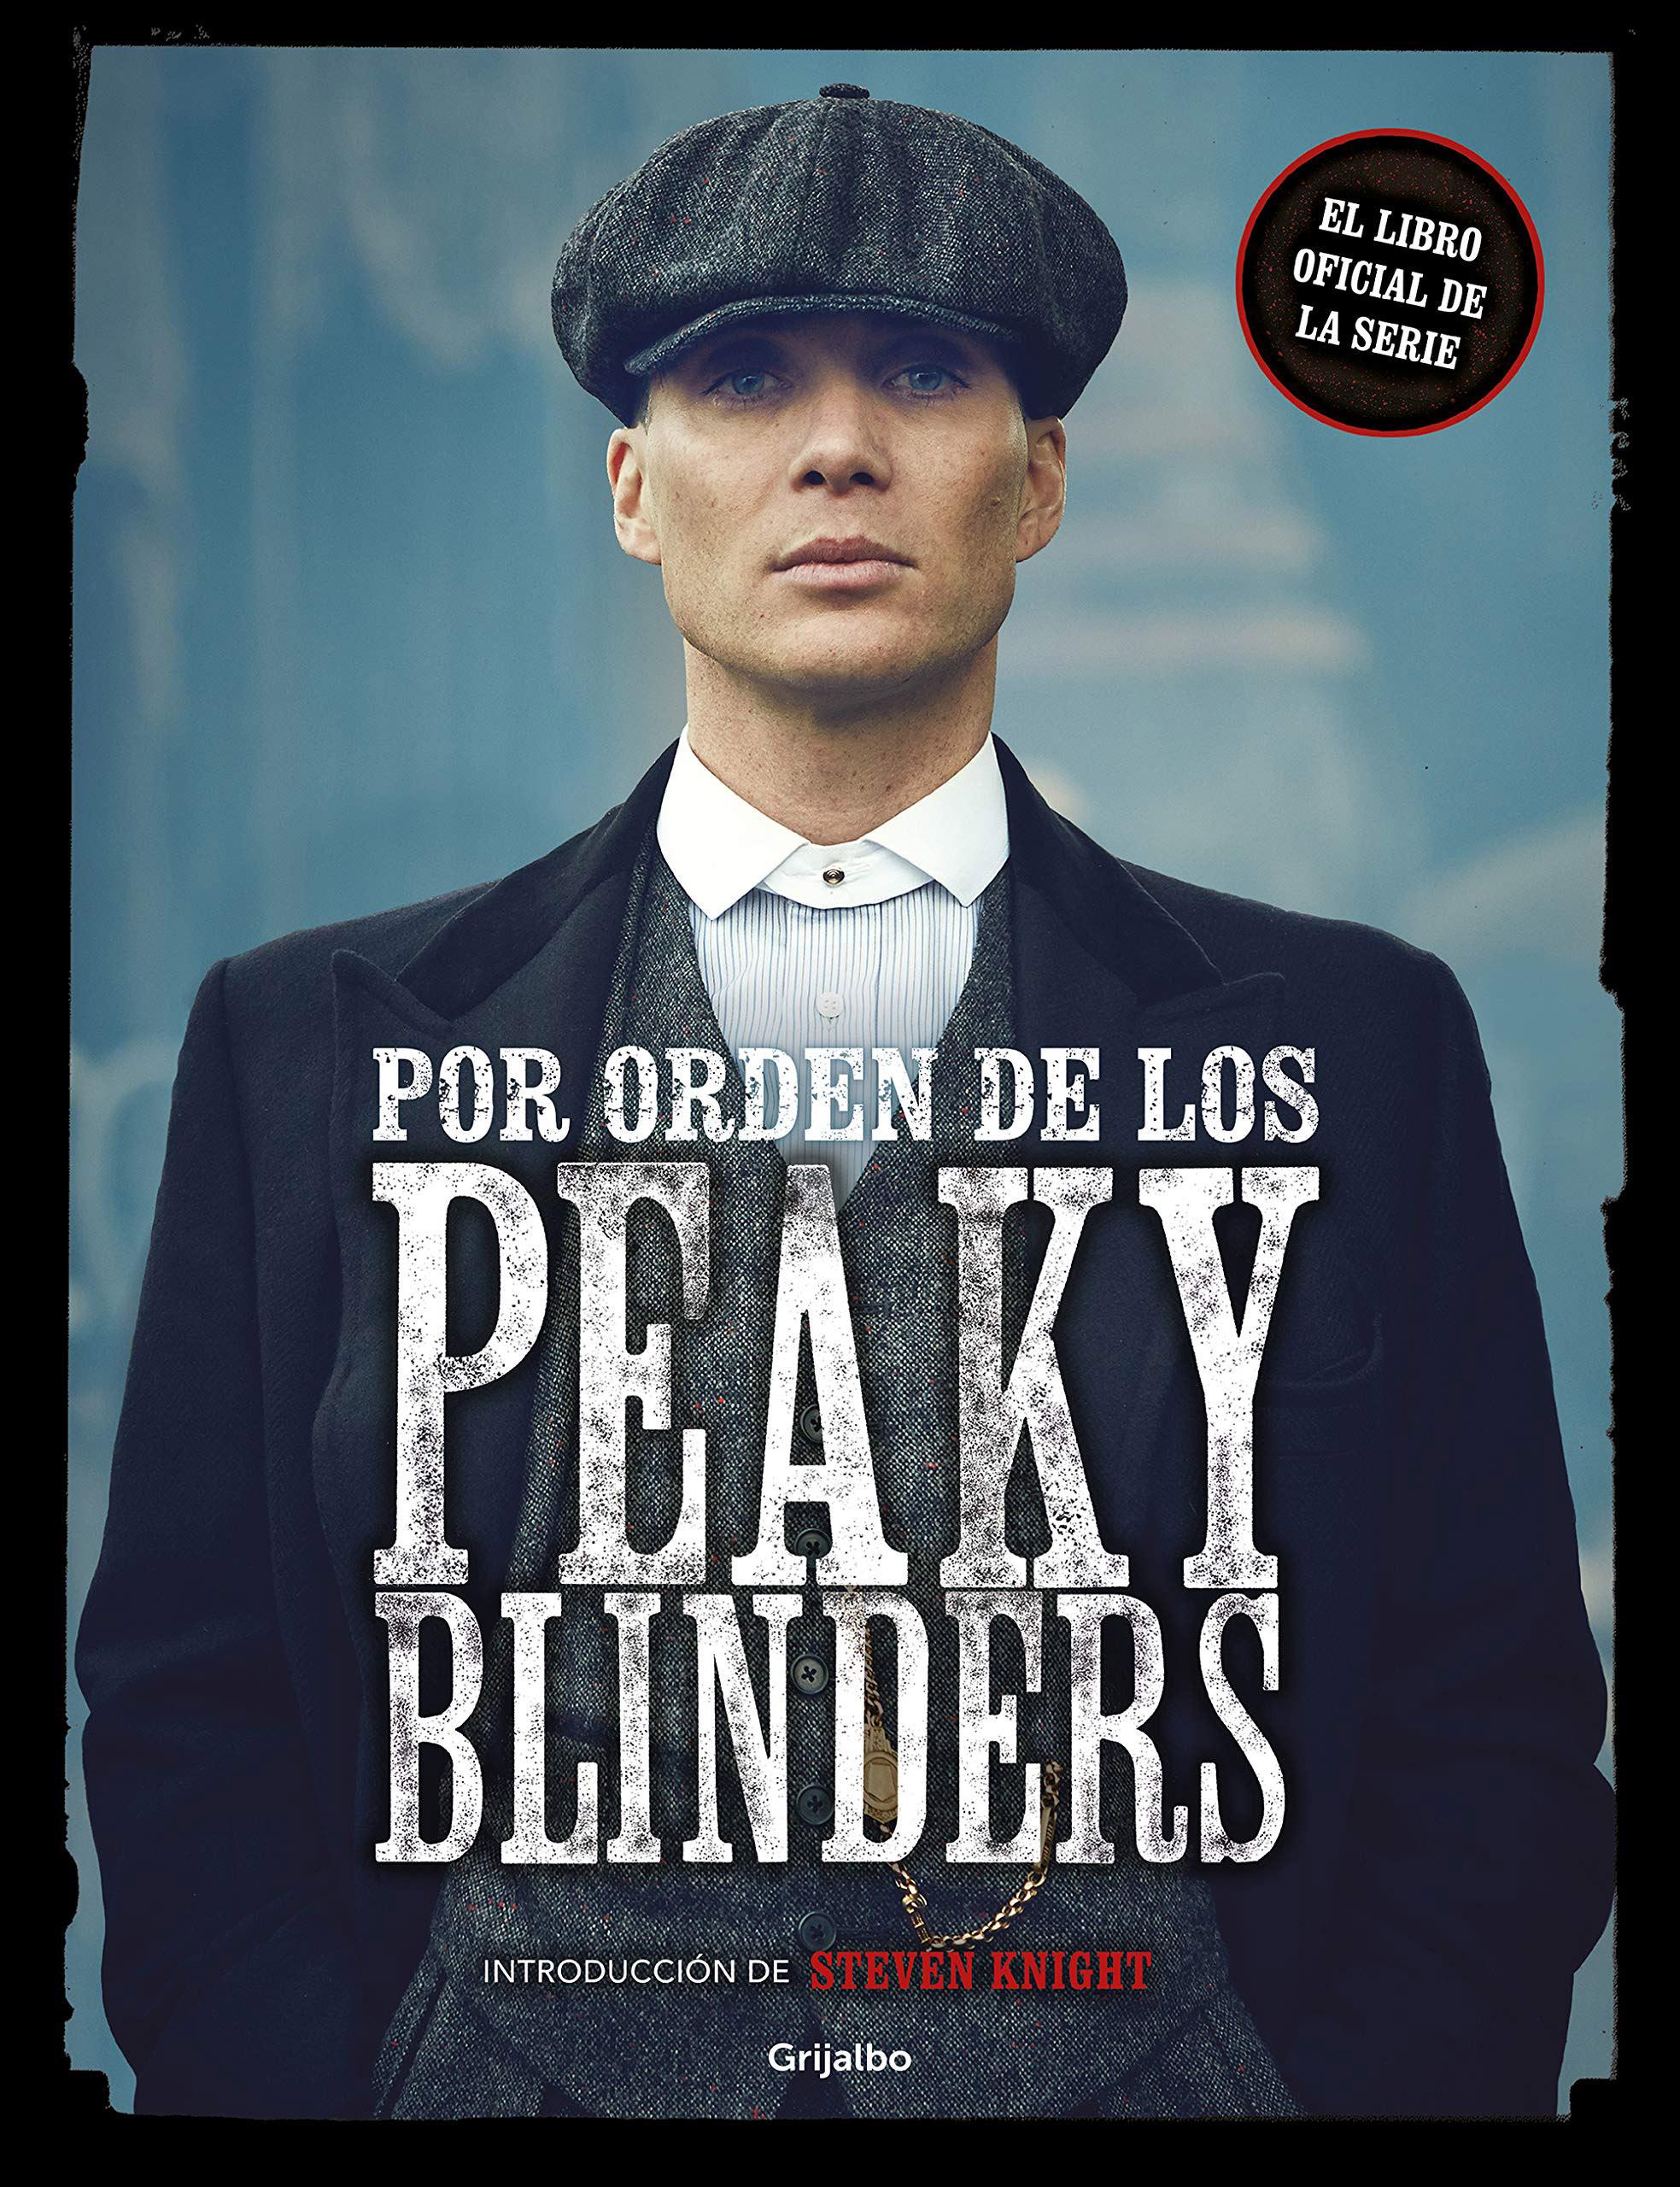 Por orden de los Peaky Blinders (Matt Allen, 2019)